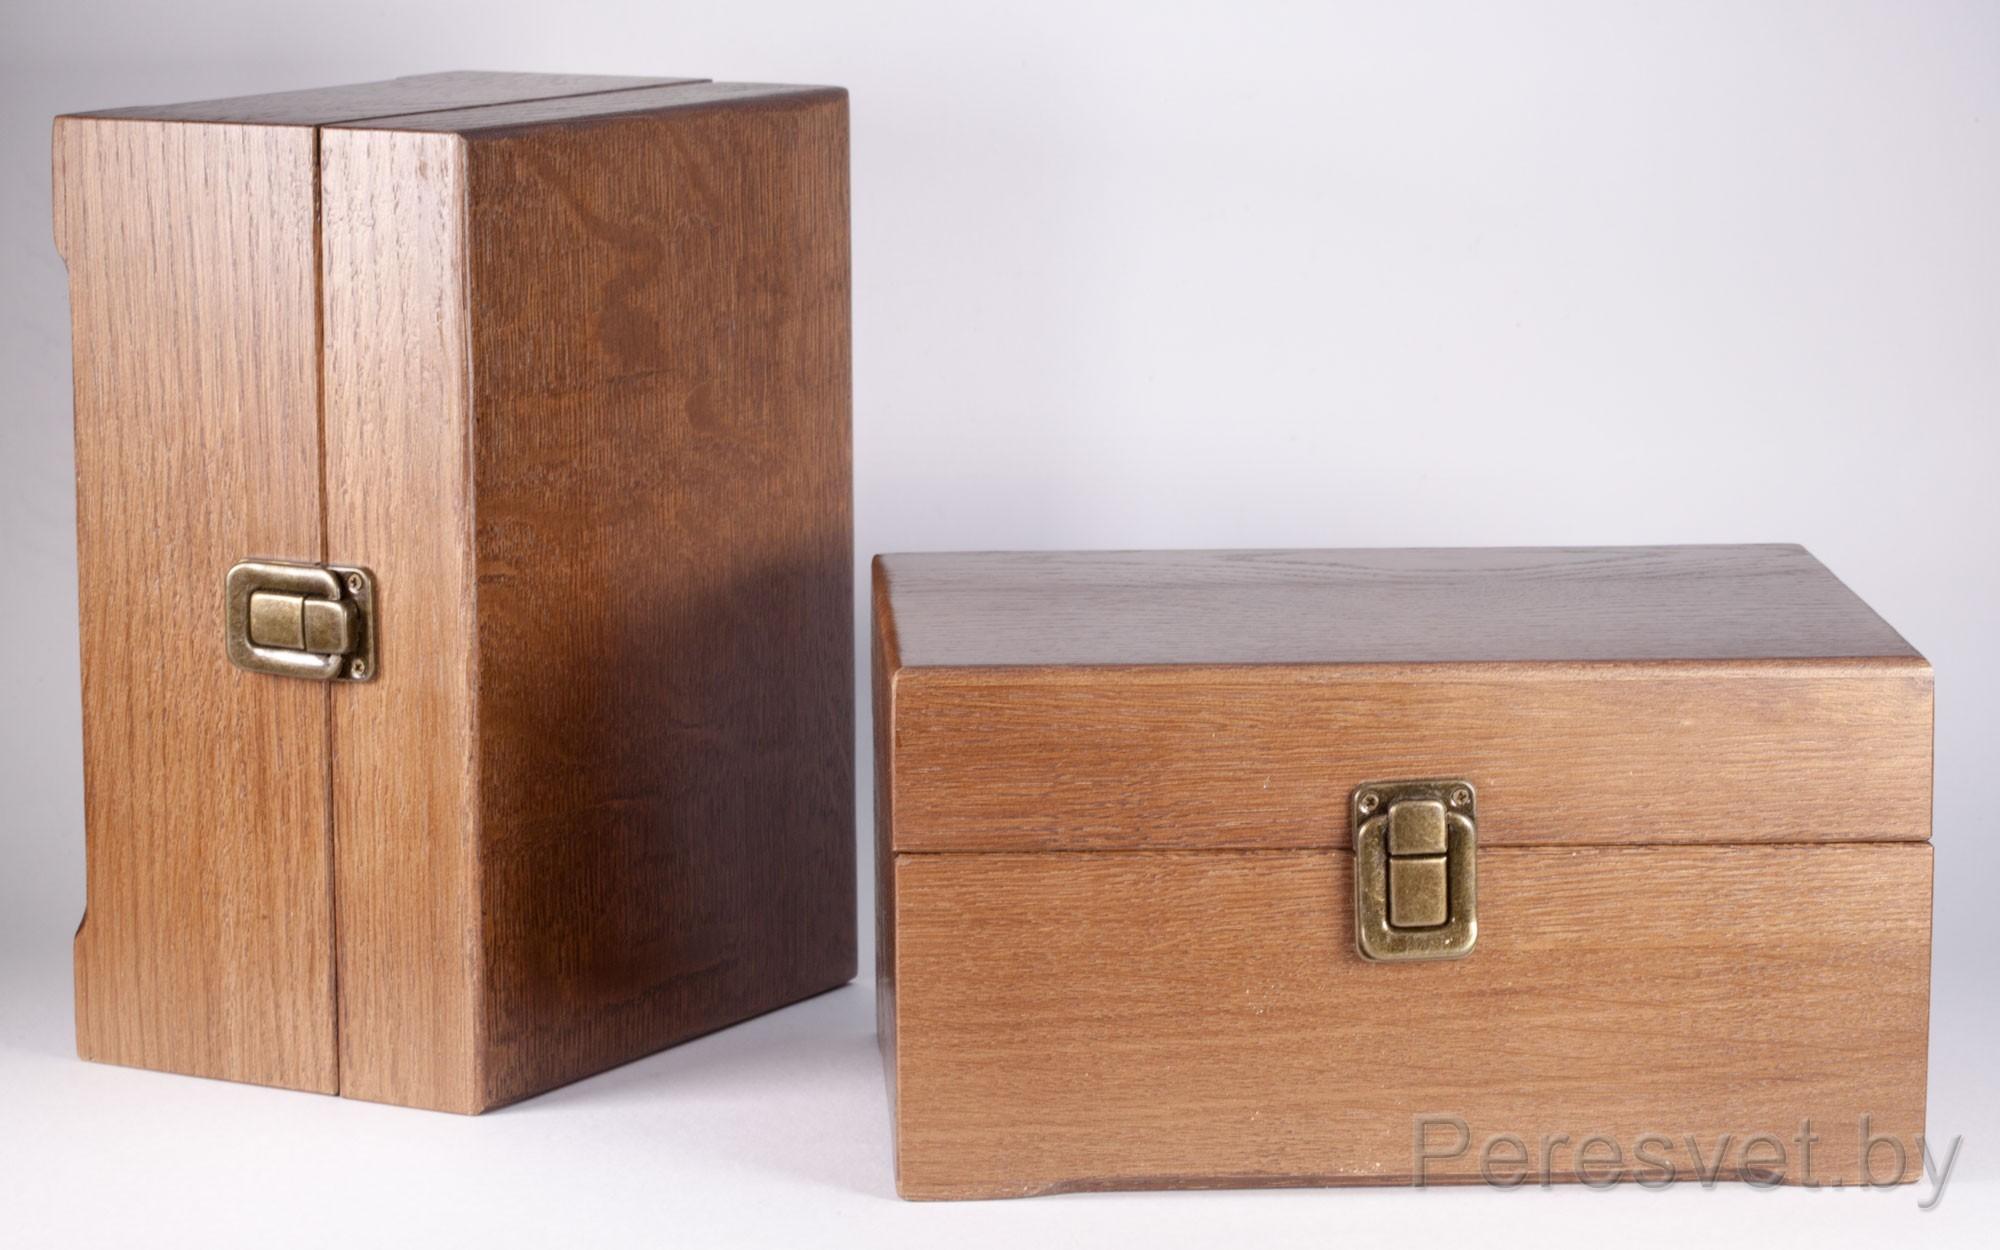 Дубовая упаковка сундук для элитных подарков на peresvet.by